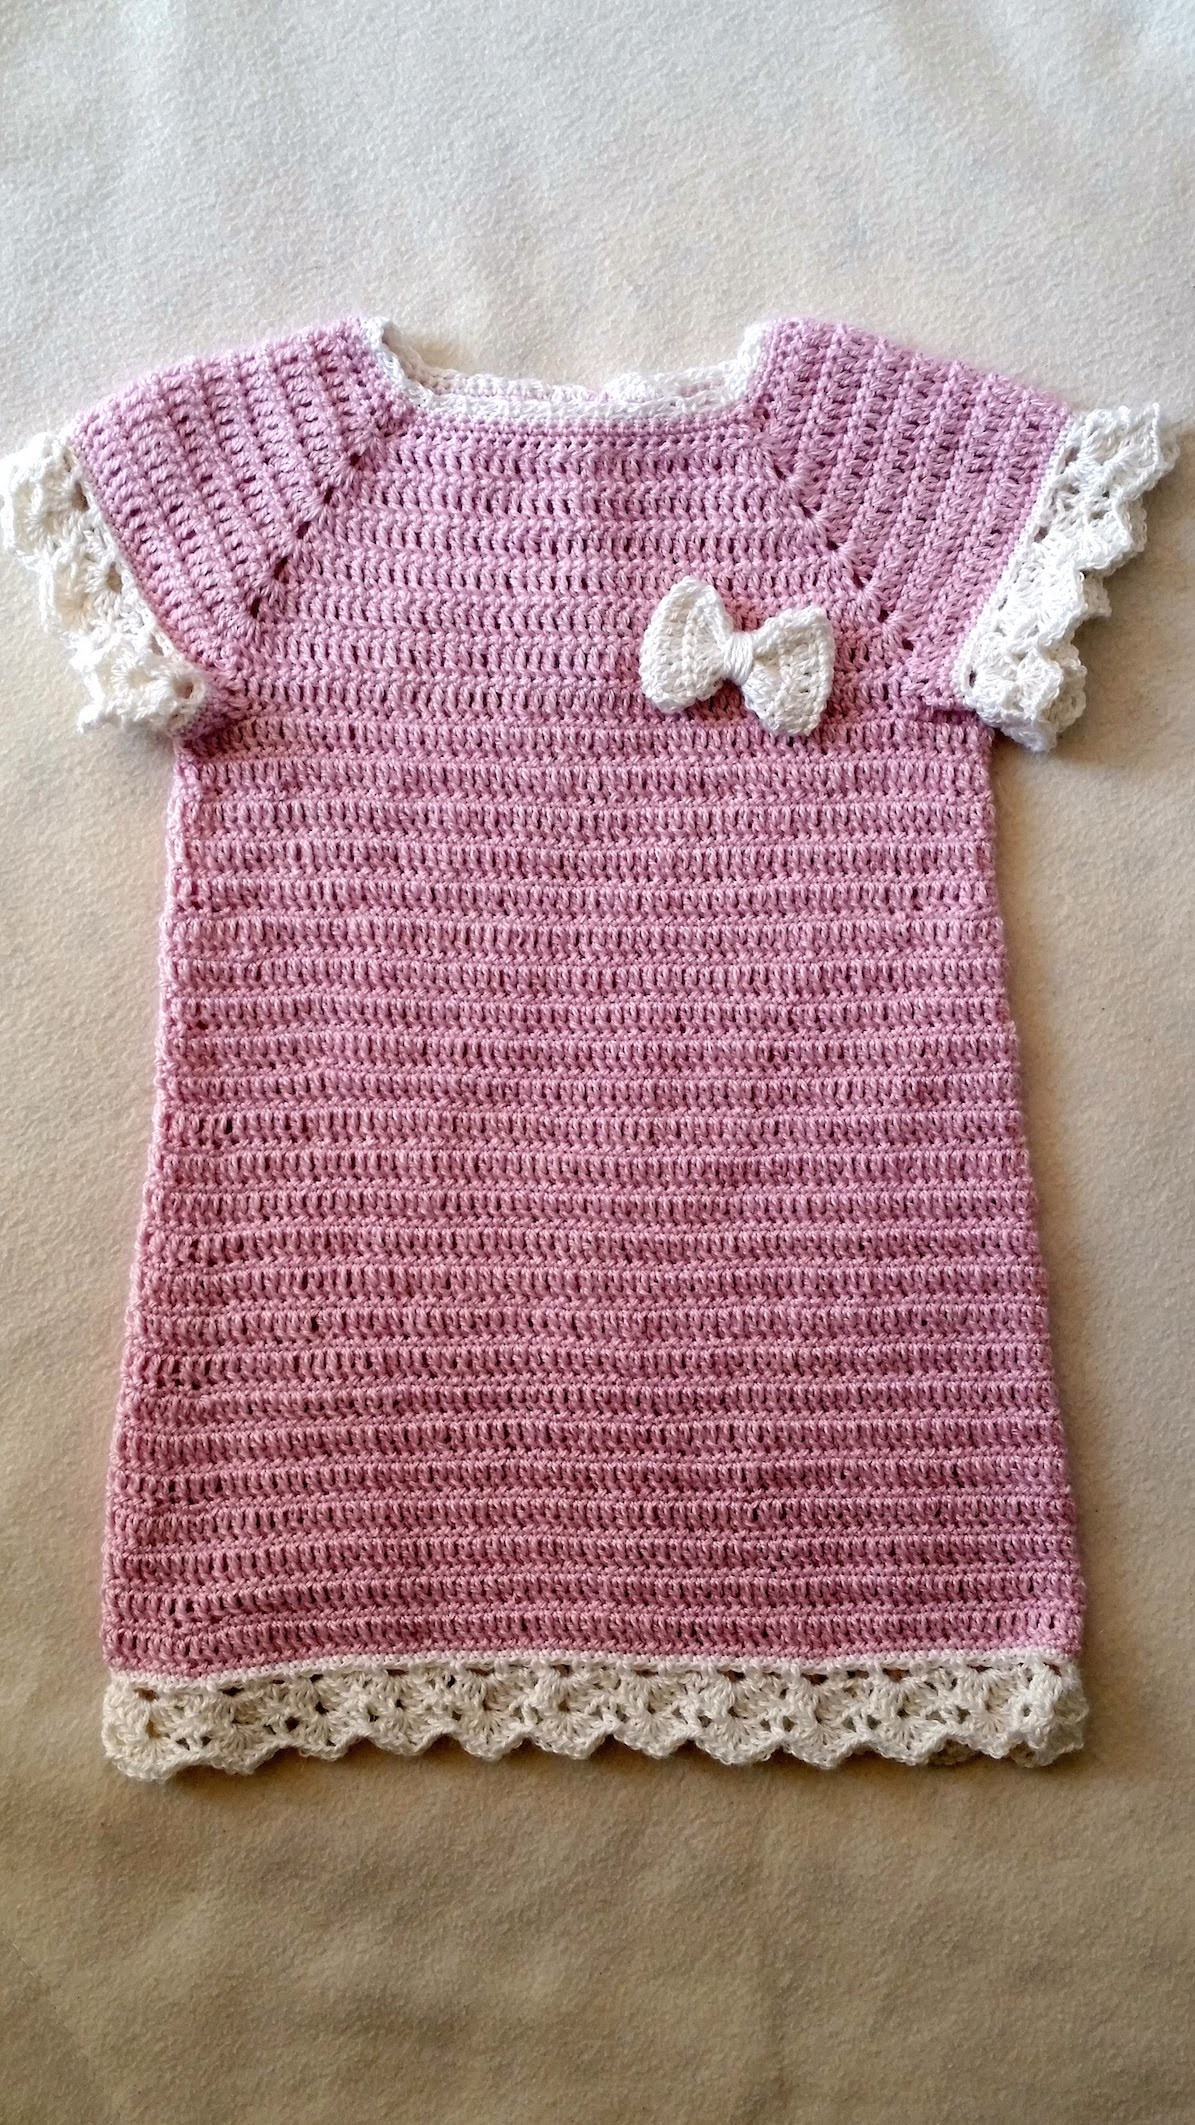 Taufkleid häkeln - Häkelkleid - Babykleid Teil 3. 6 by Berlin Crochet